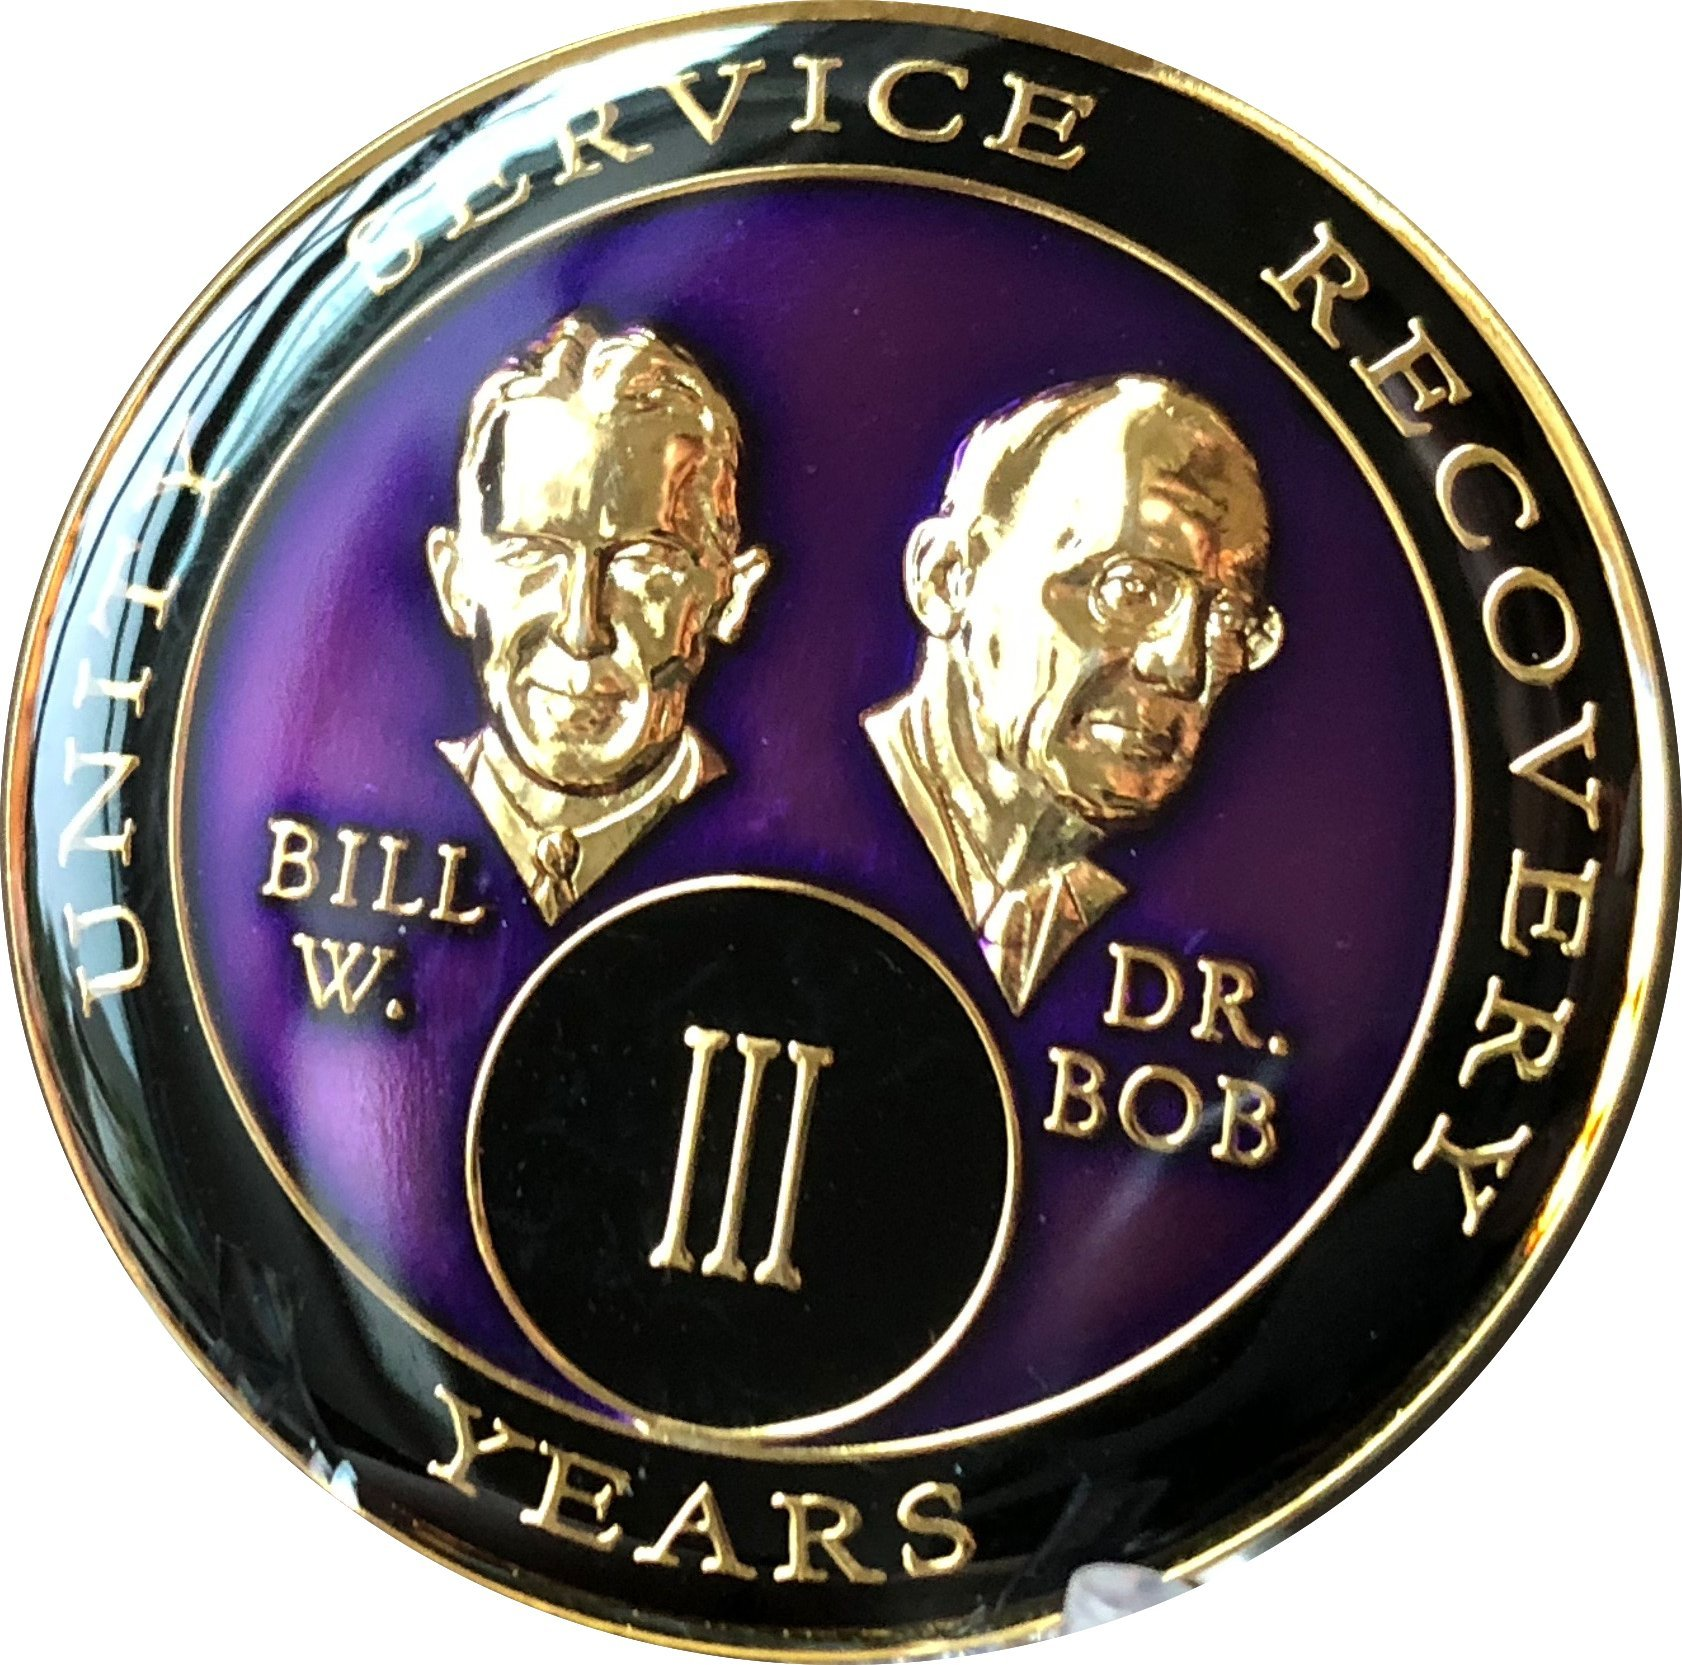 3 year AA Medallion Purple Tri-Plate Founders Bill & Bob Chip III